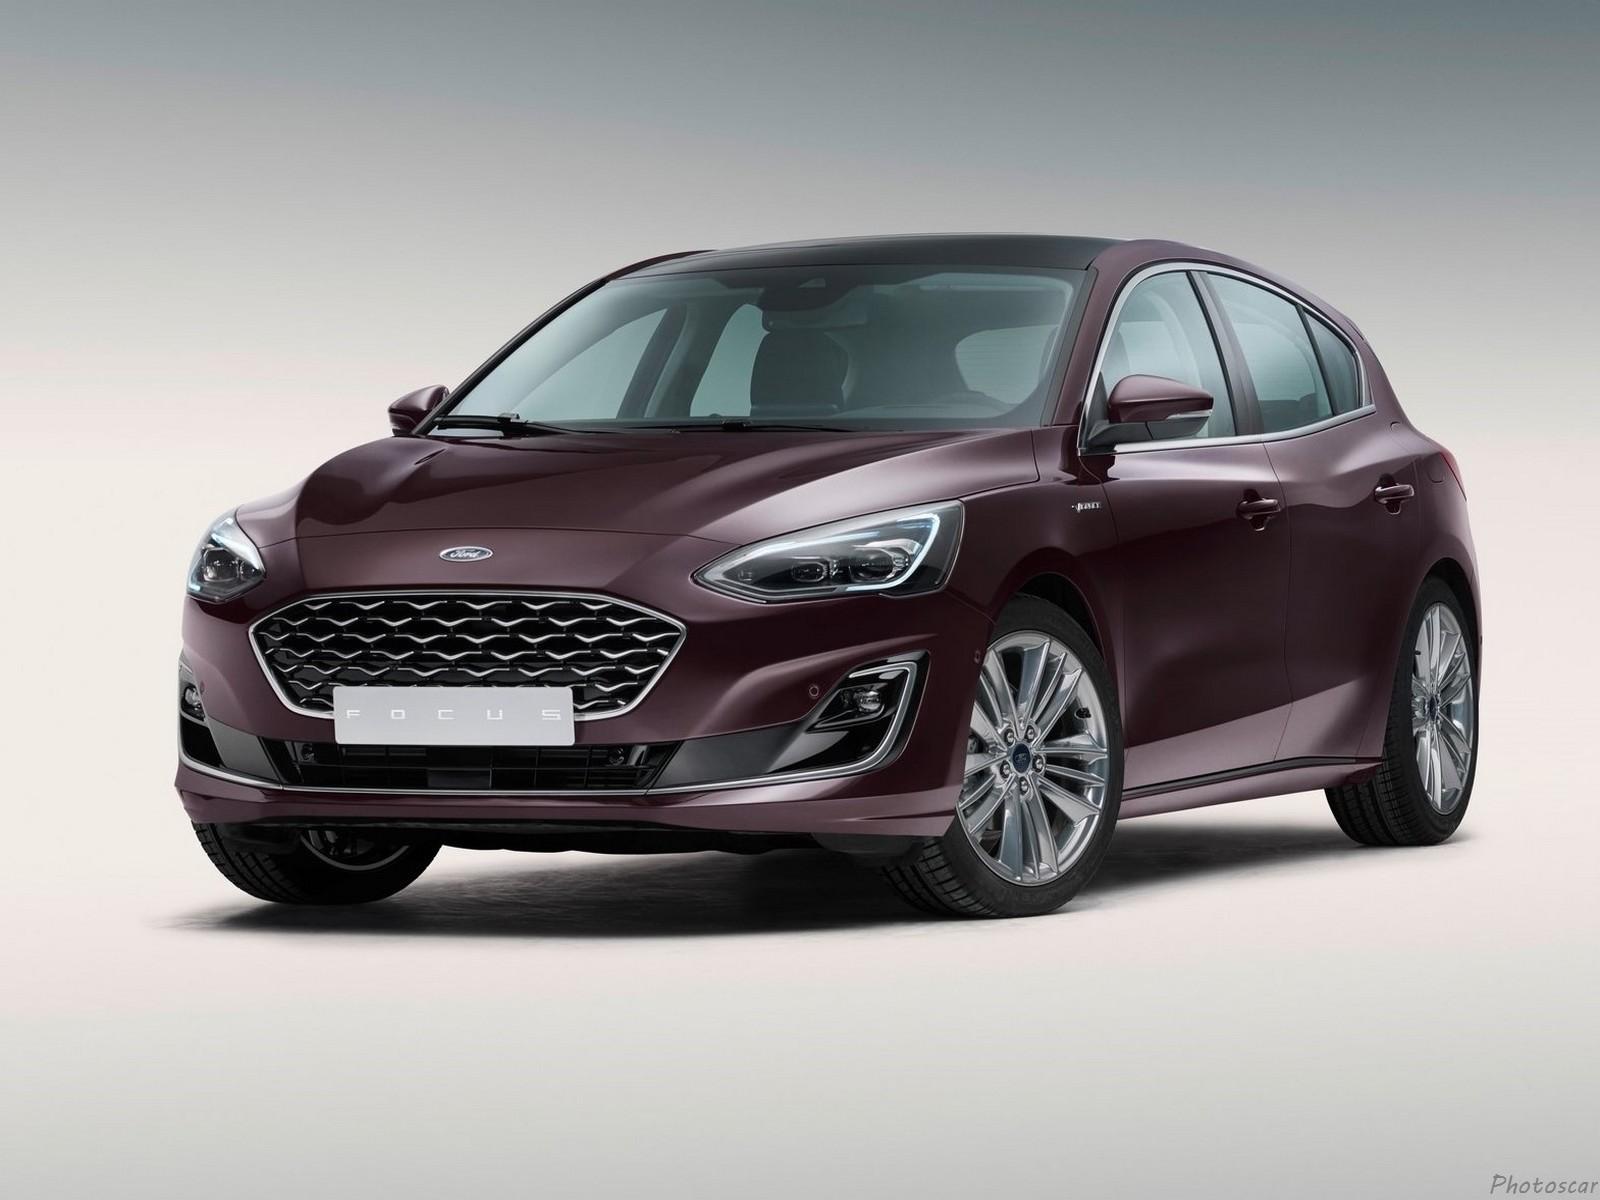 Ford Focus Vignale 2019 – La version la plus premium et exclusive